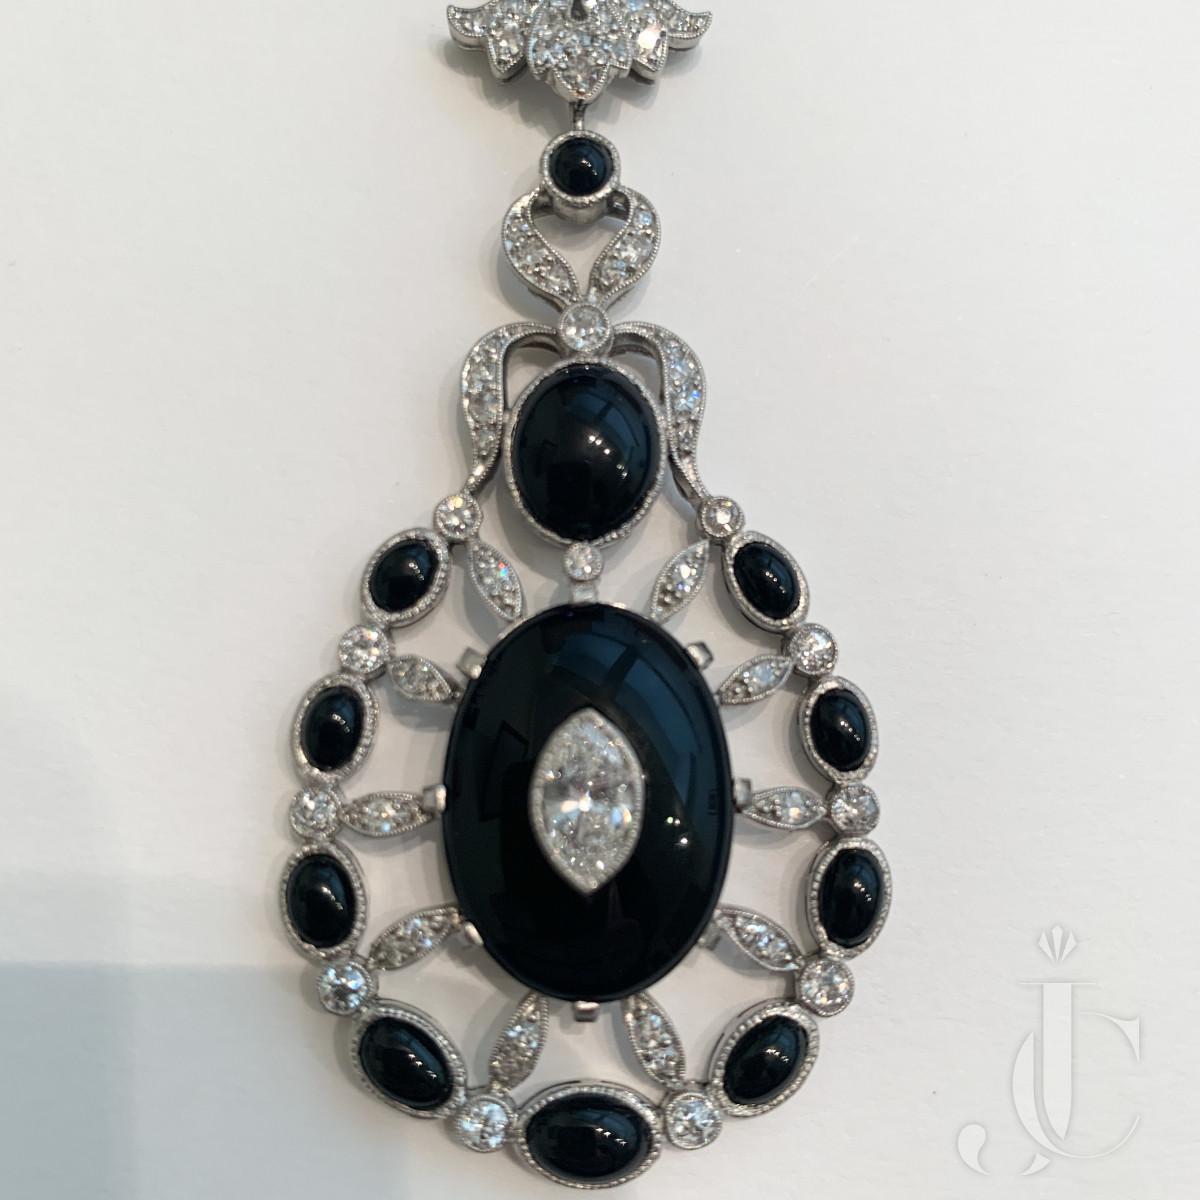 onyx and diamond necklace